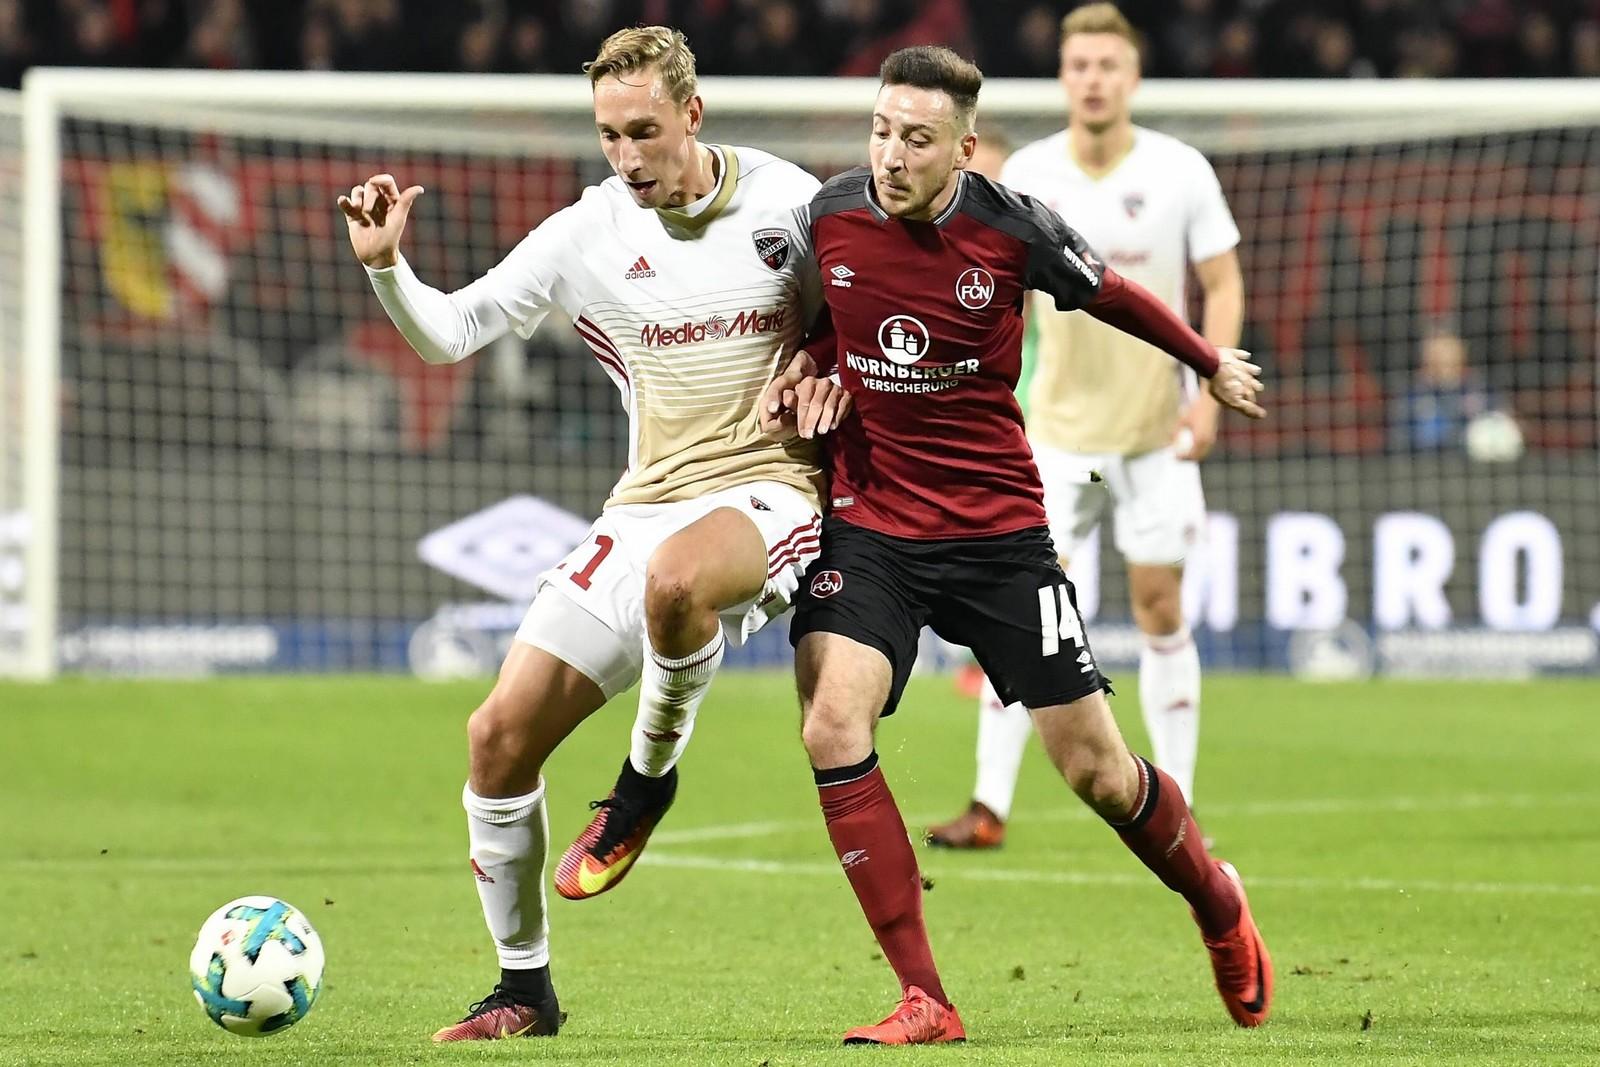 Tobias Schröck vom FC Ingolstadt gegen Kevin Möhwald vom 1. FC Nürnberg